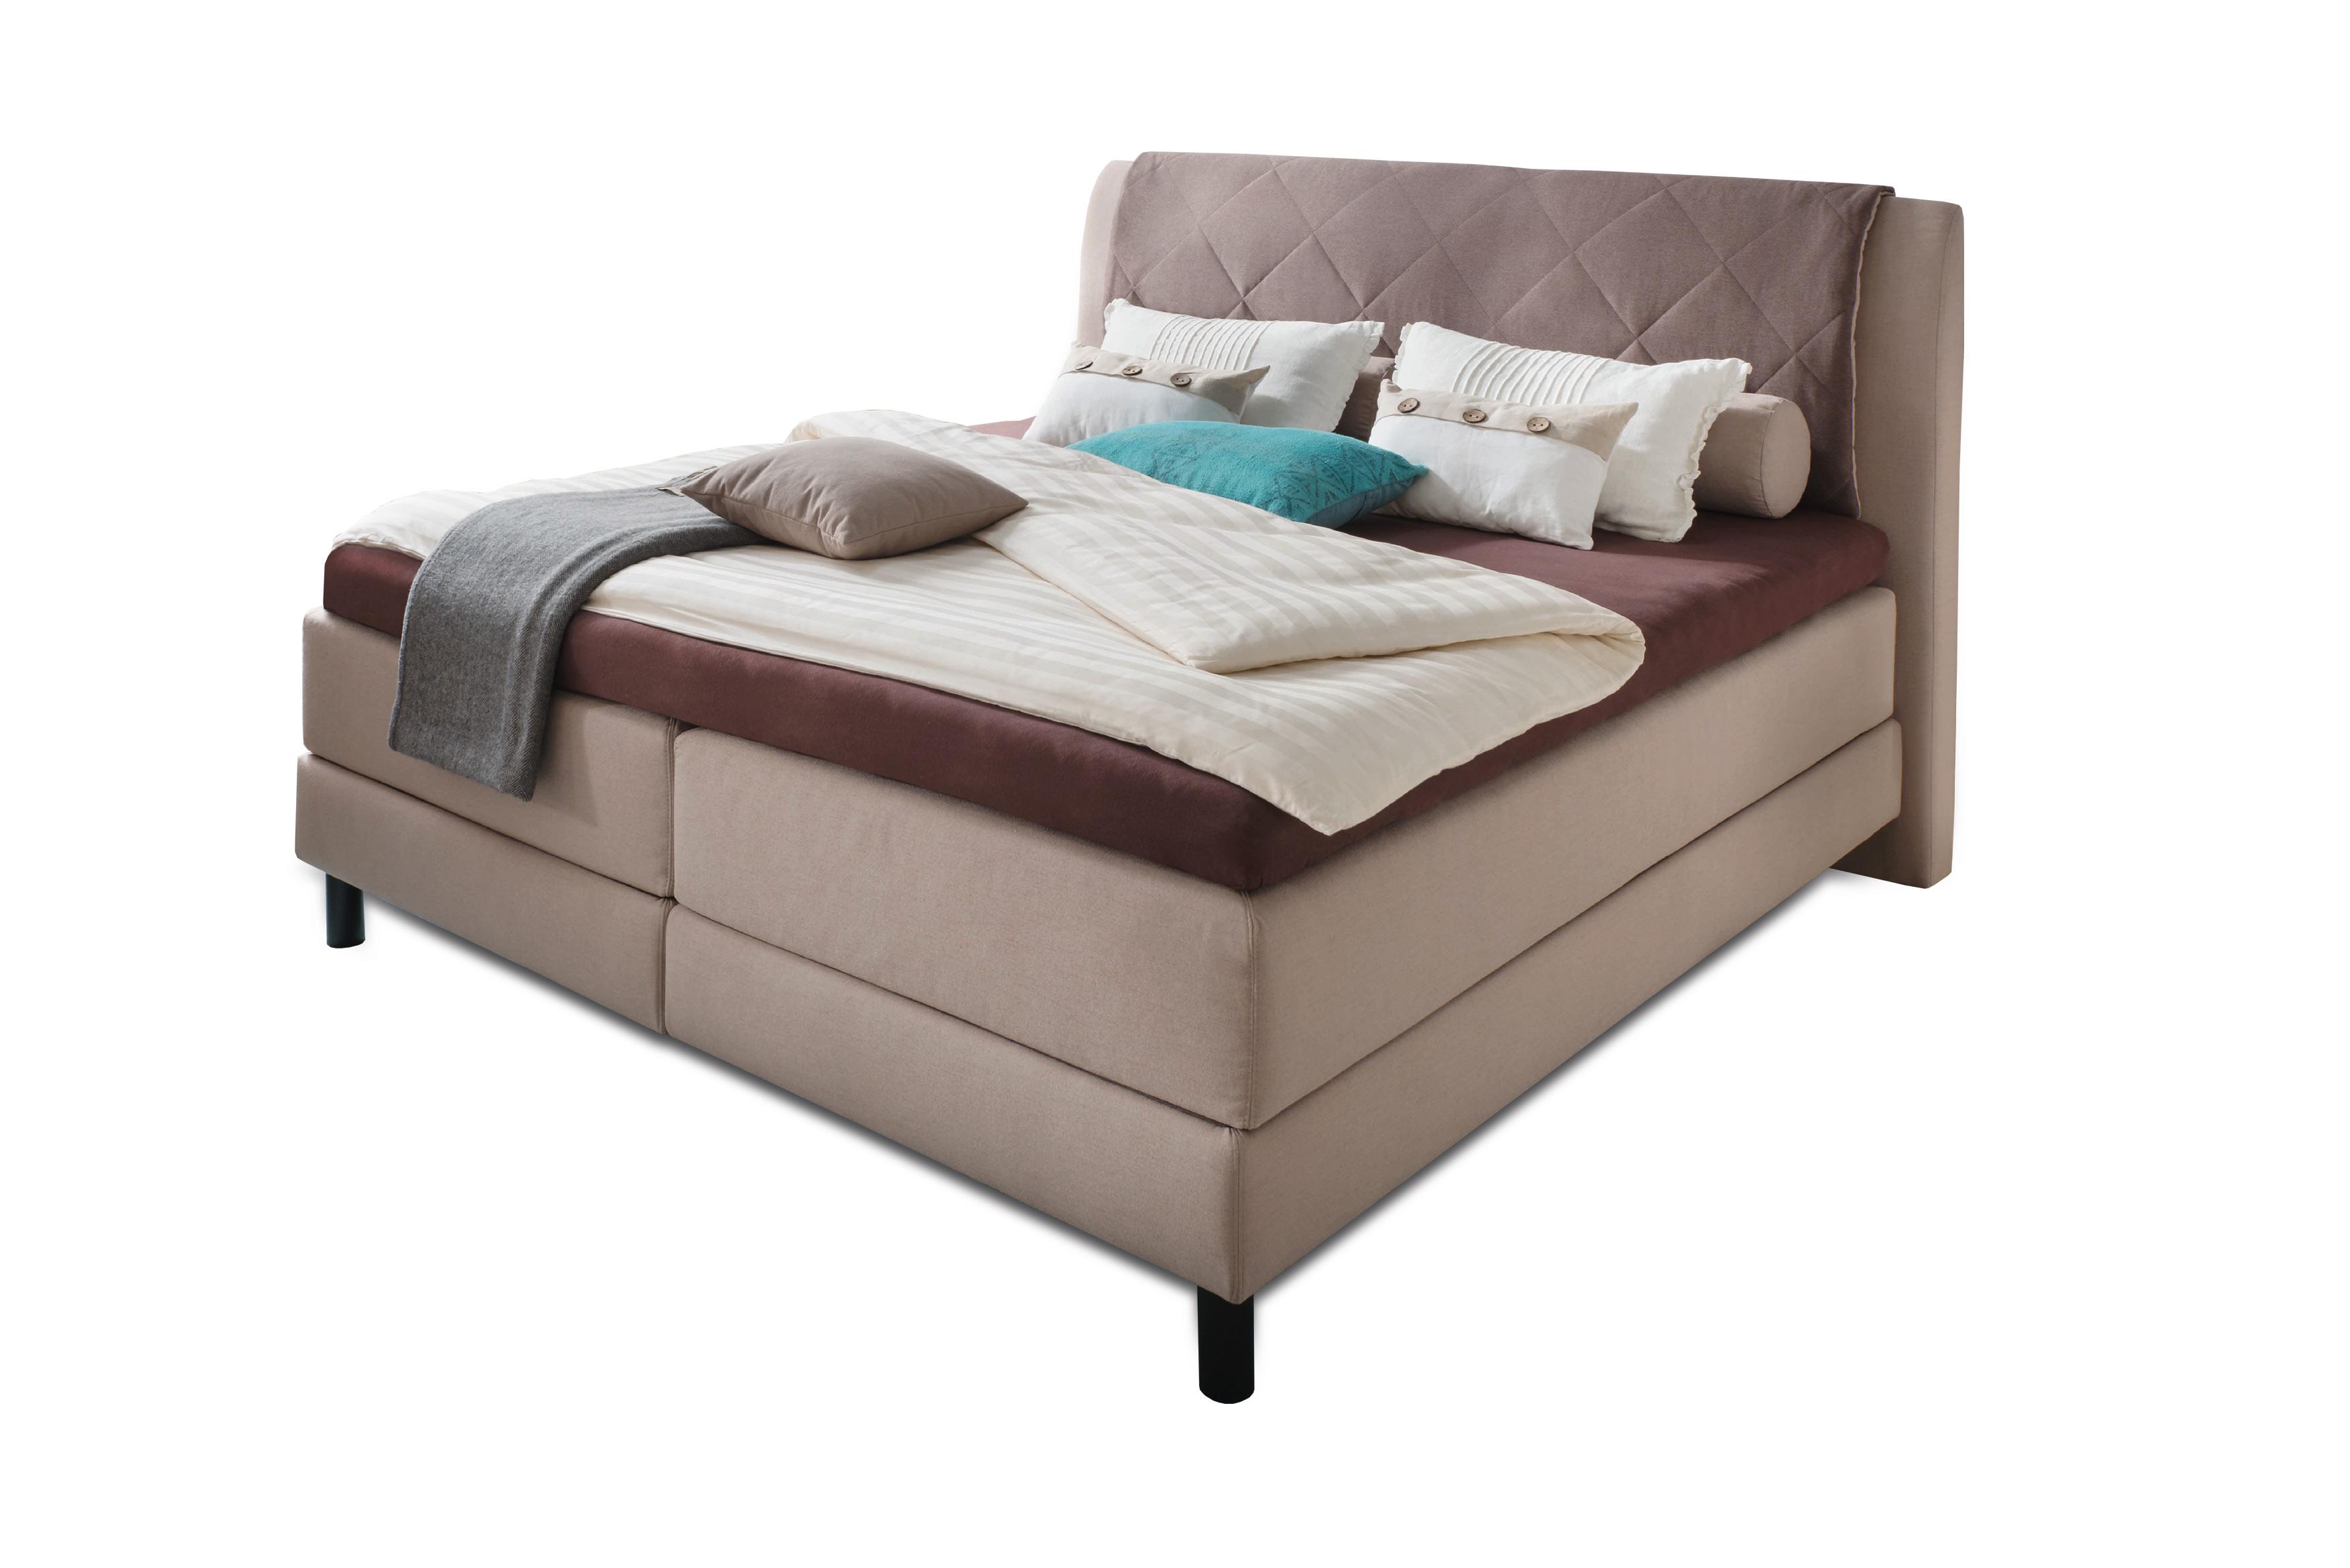 otten boxspringbett. Black Bedroom Furniture Sets. Home Design Ideas